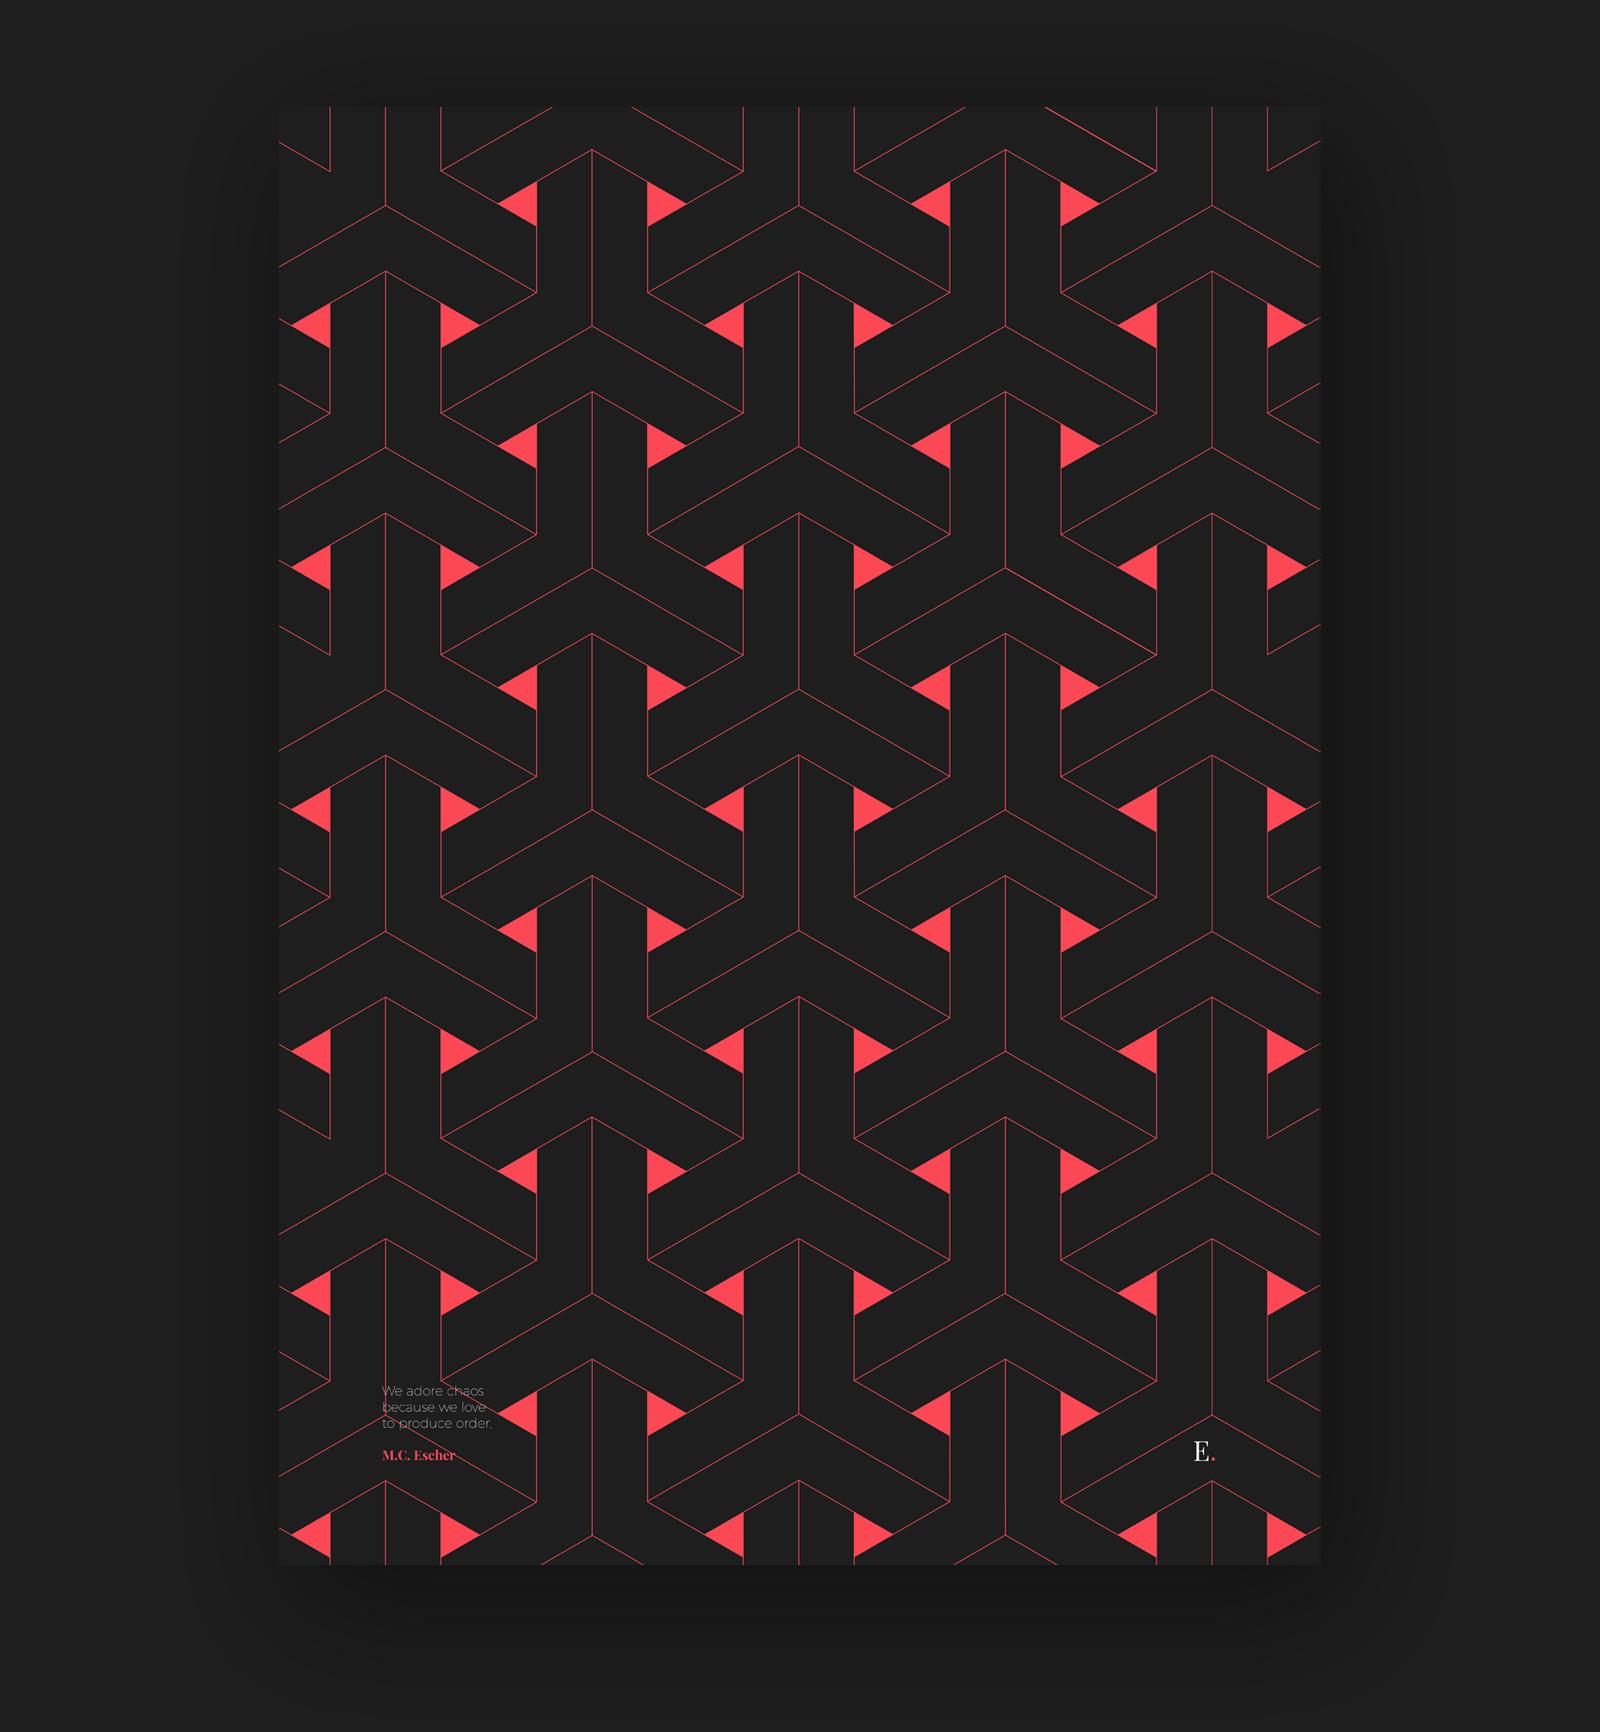 Tribute to Escher - 2